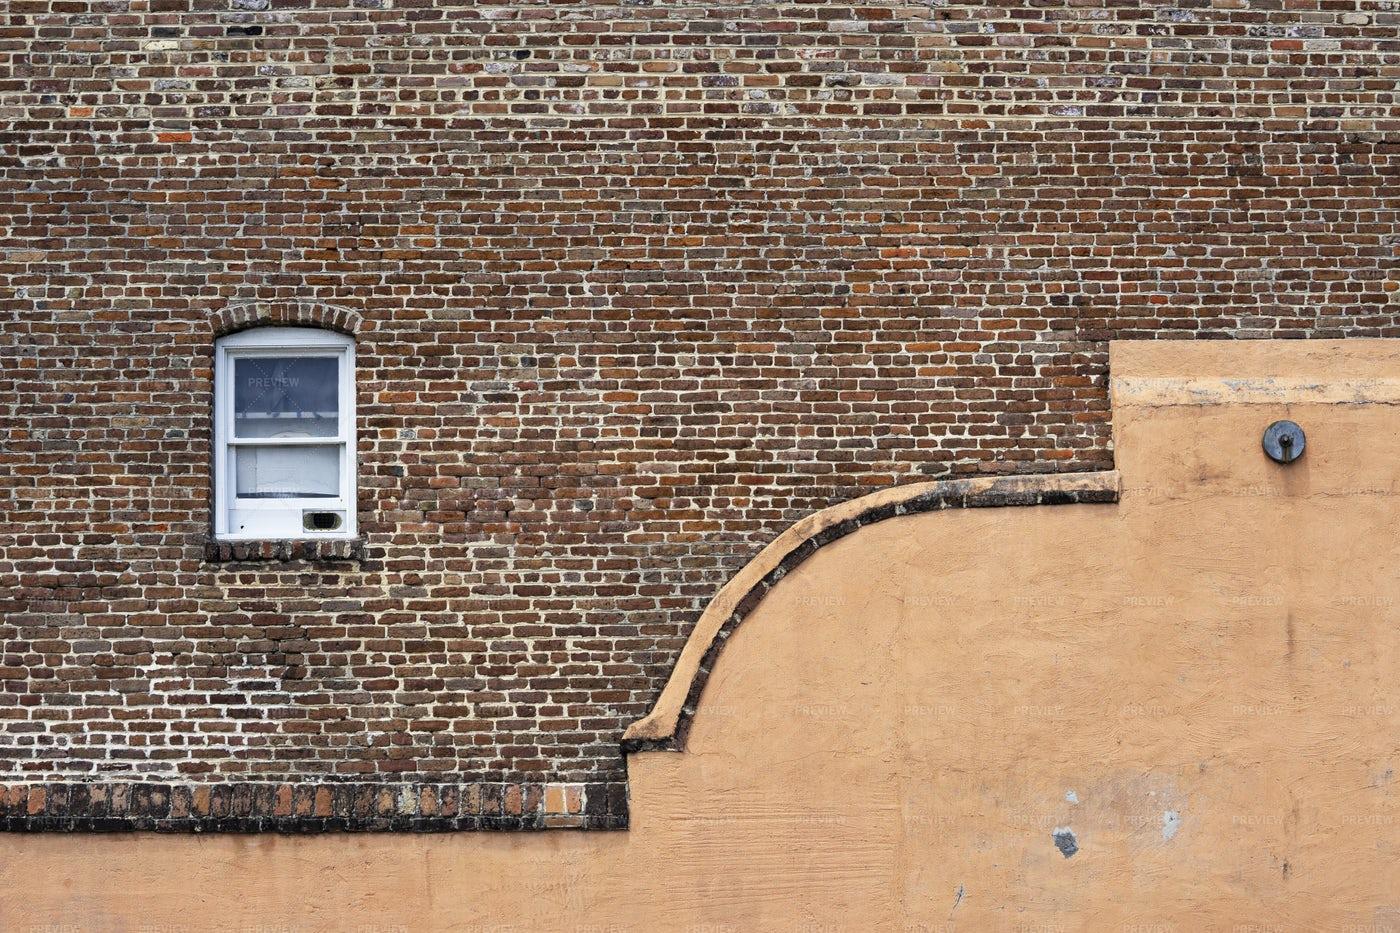 Vintage Brick Wall With Window: Stock Photos